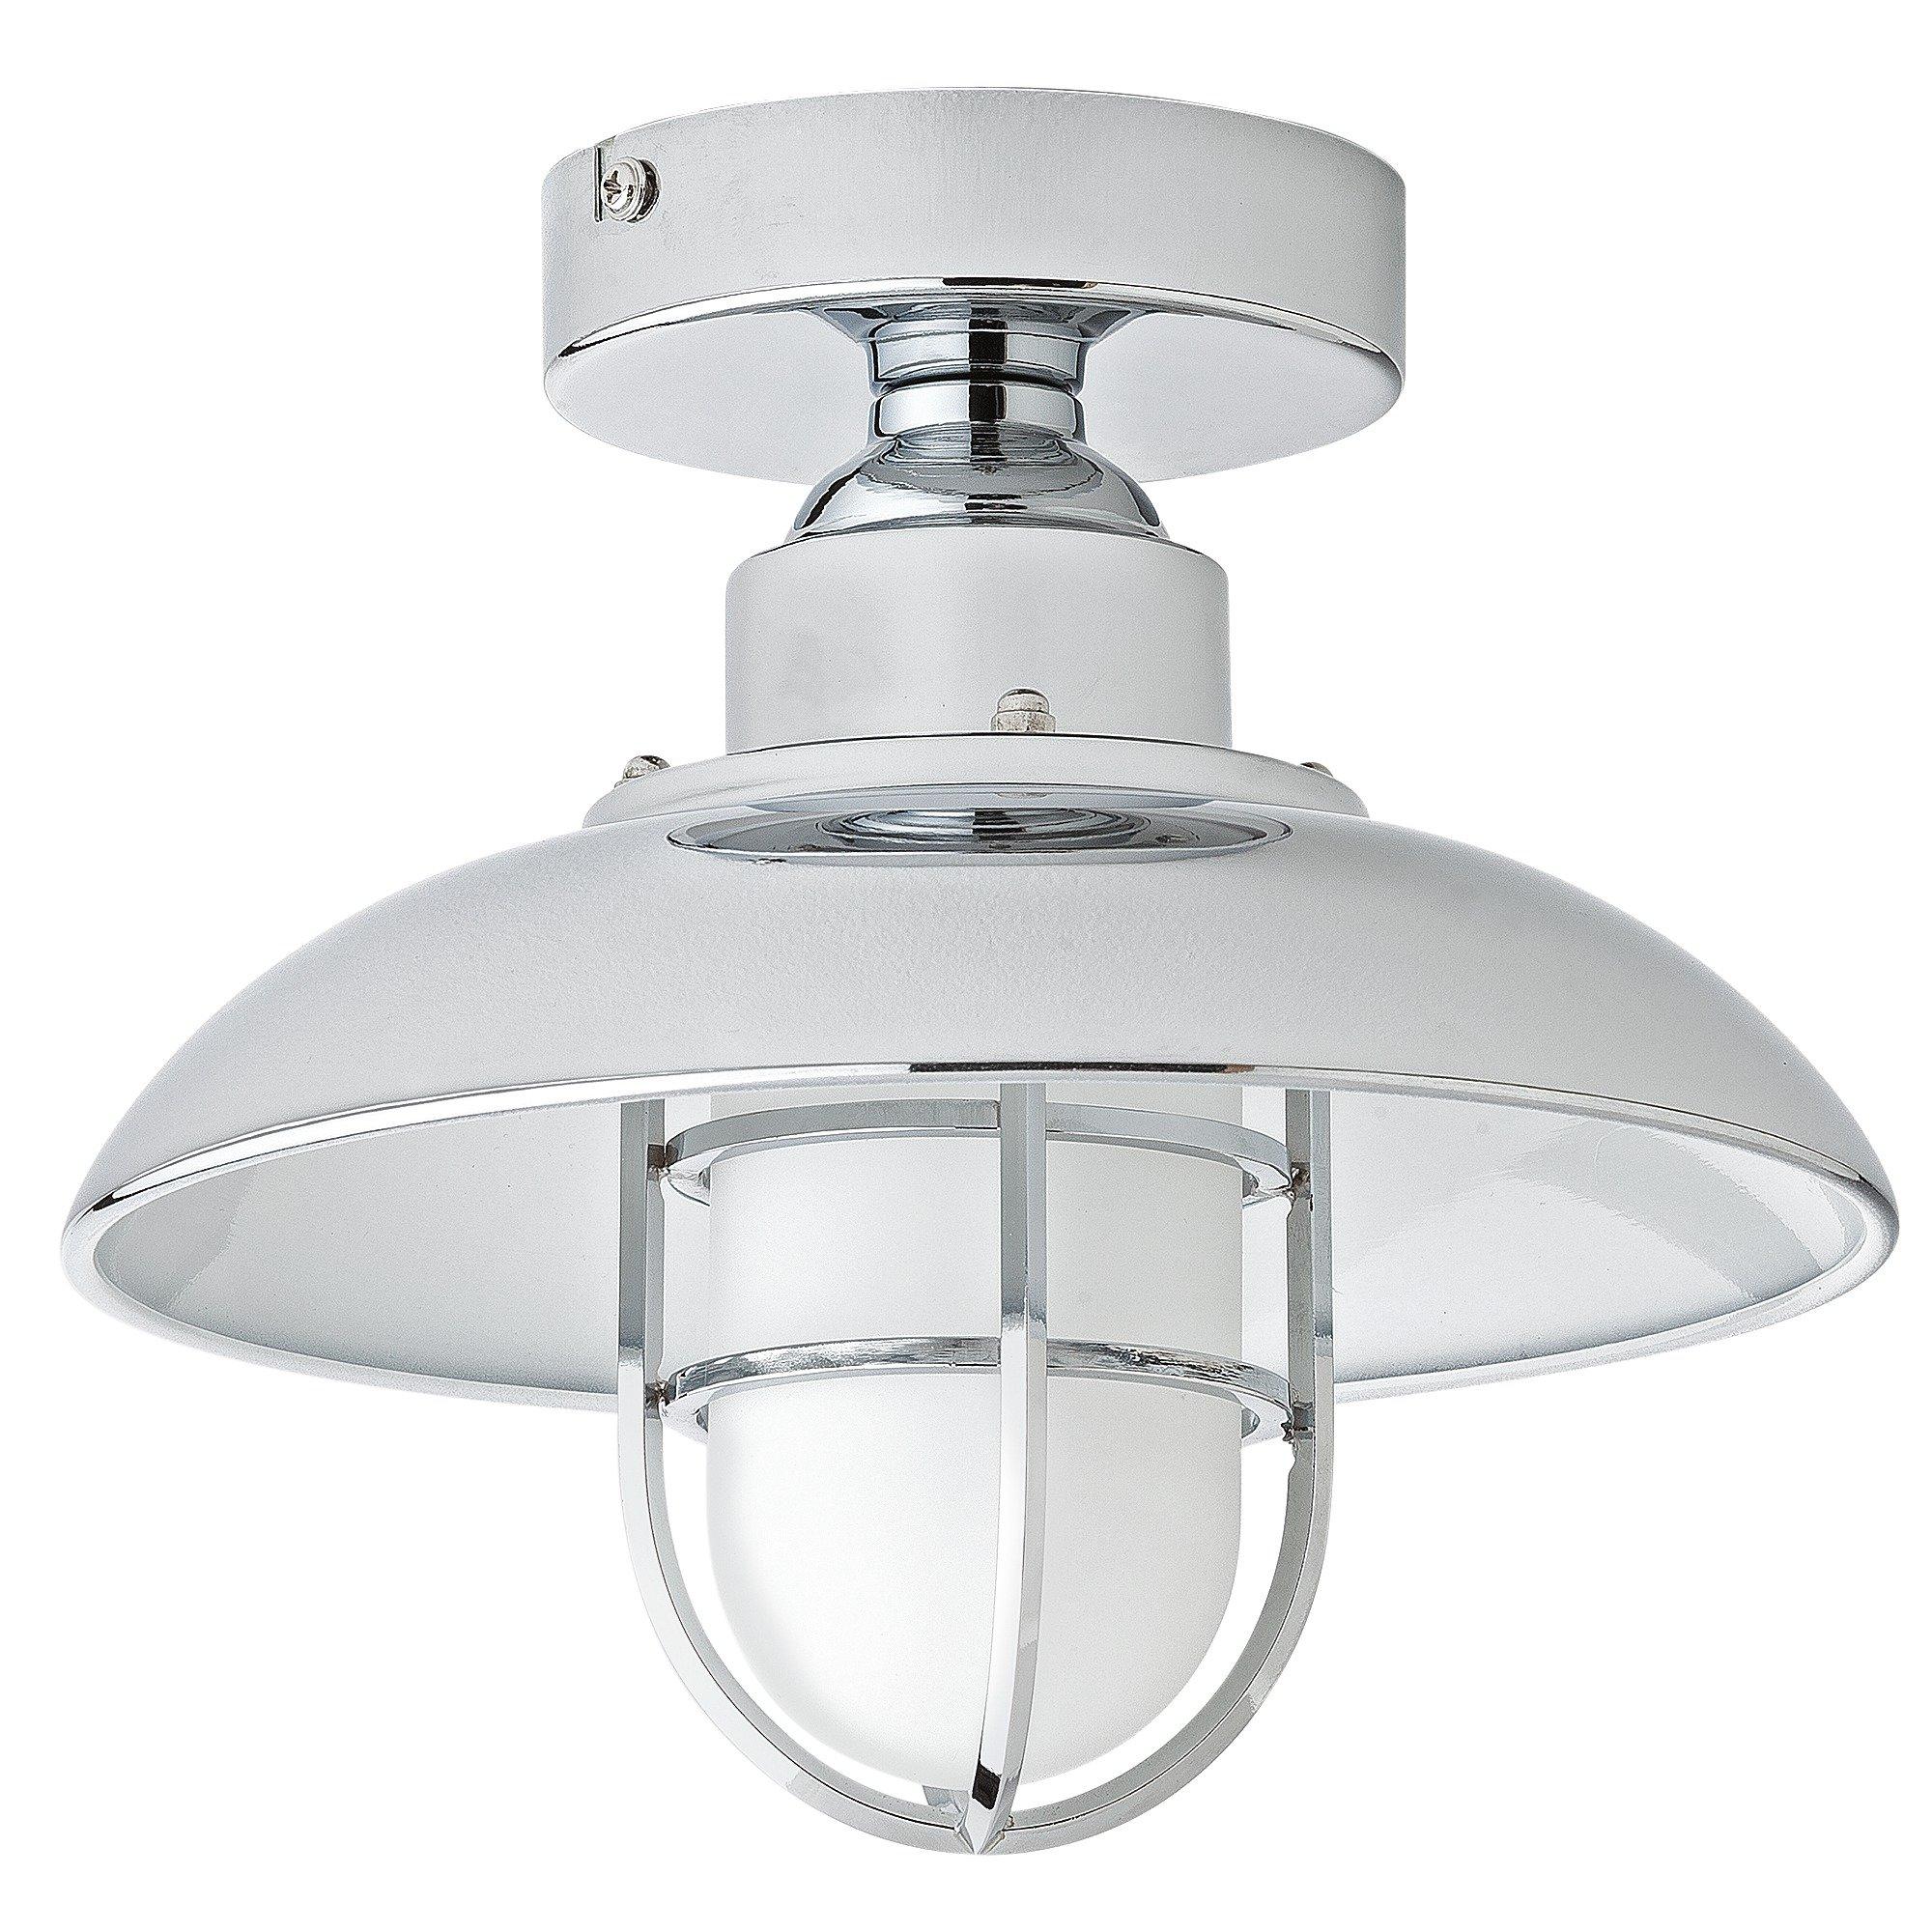 Argos Home Kildare Fisherman Lantern Bathroom Light   Nickle